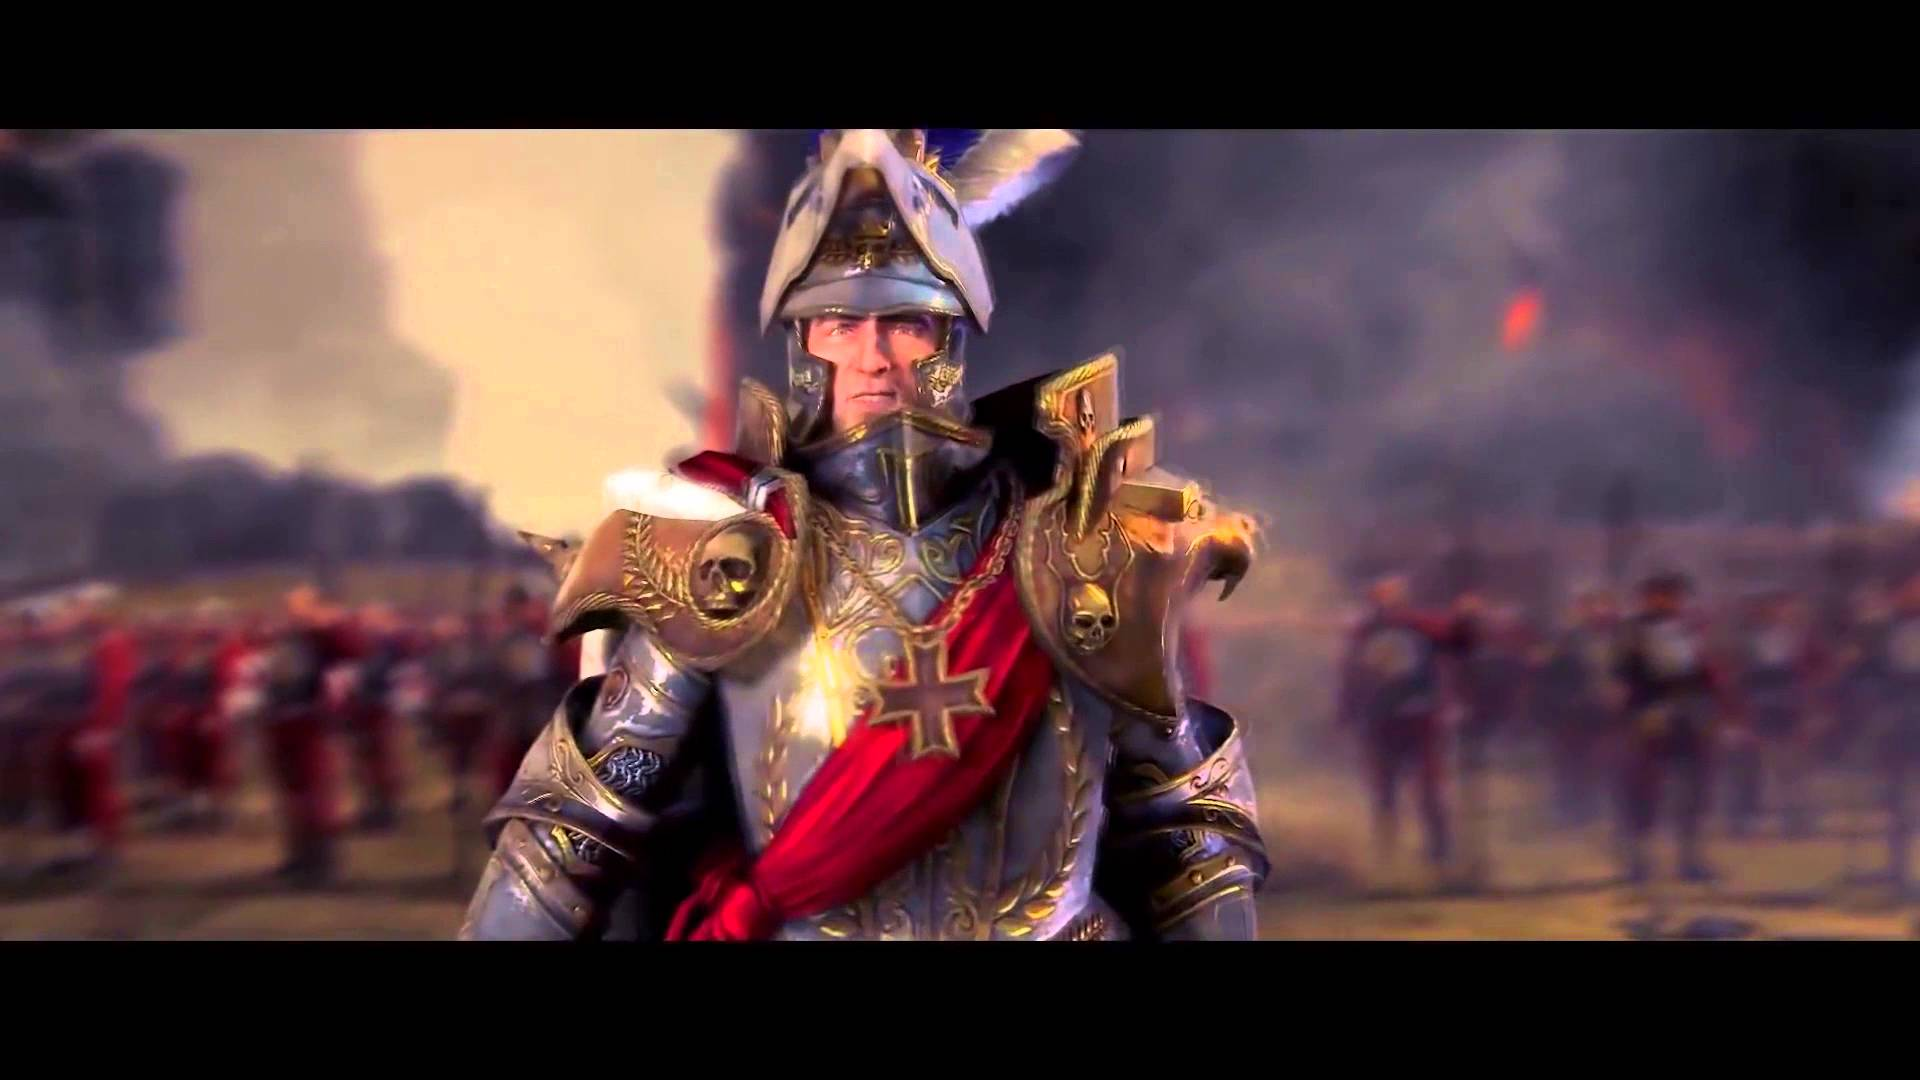 Total War Warhammer Wallpaper Hd Total War Warhammer Review Is It Worth Playing Gamers